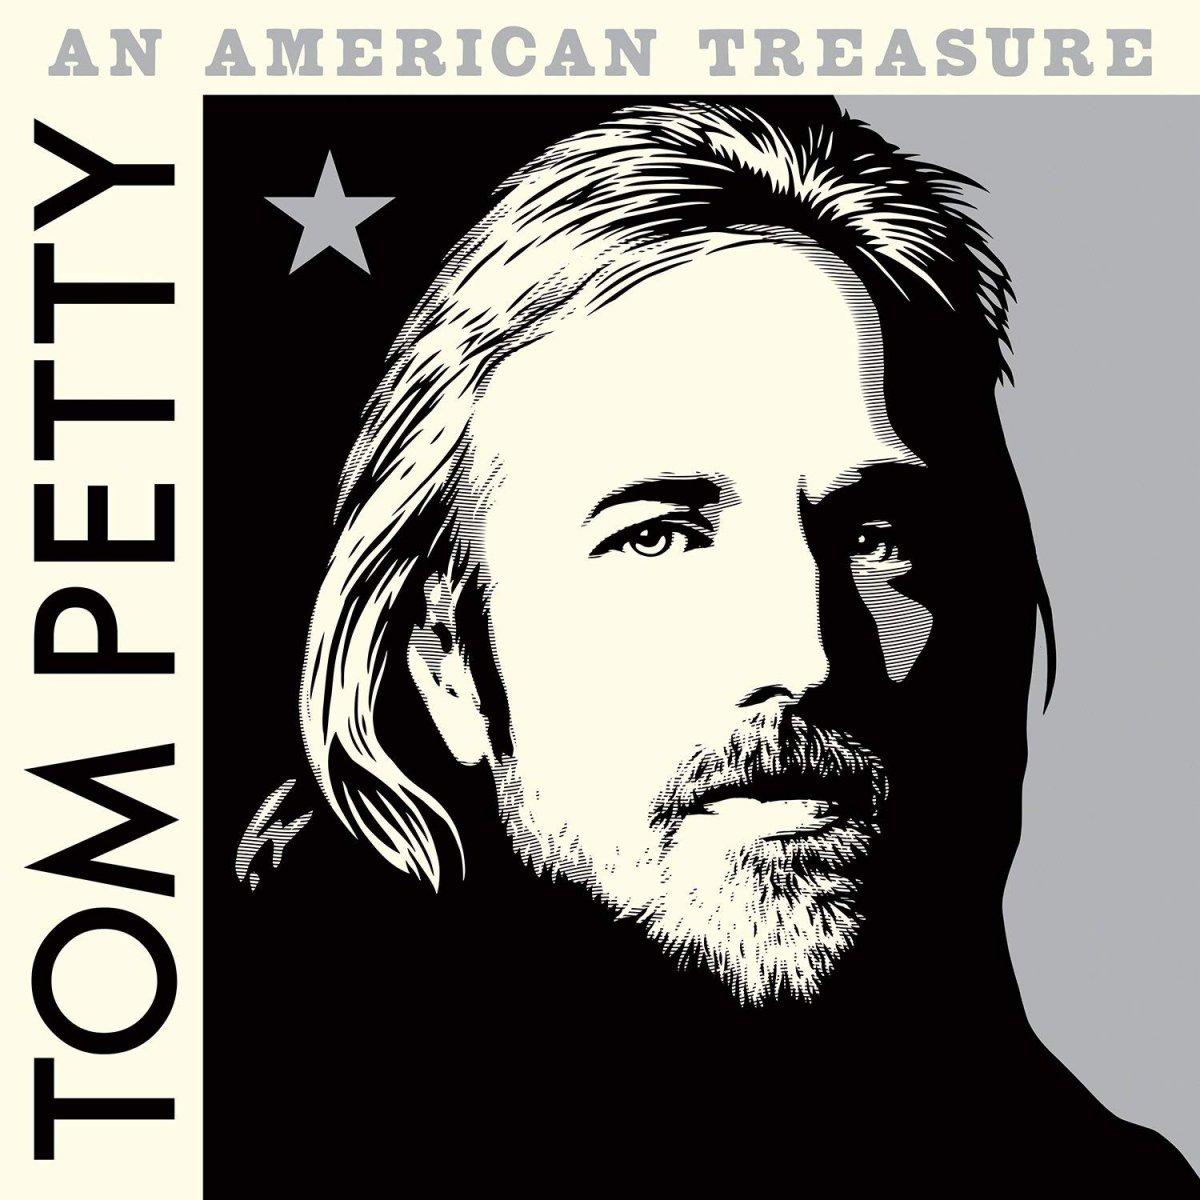 Tom Petty An American Treasure